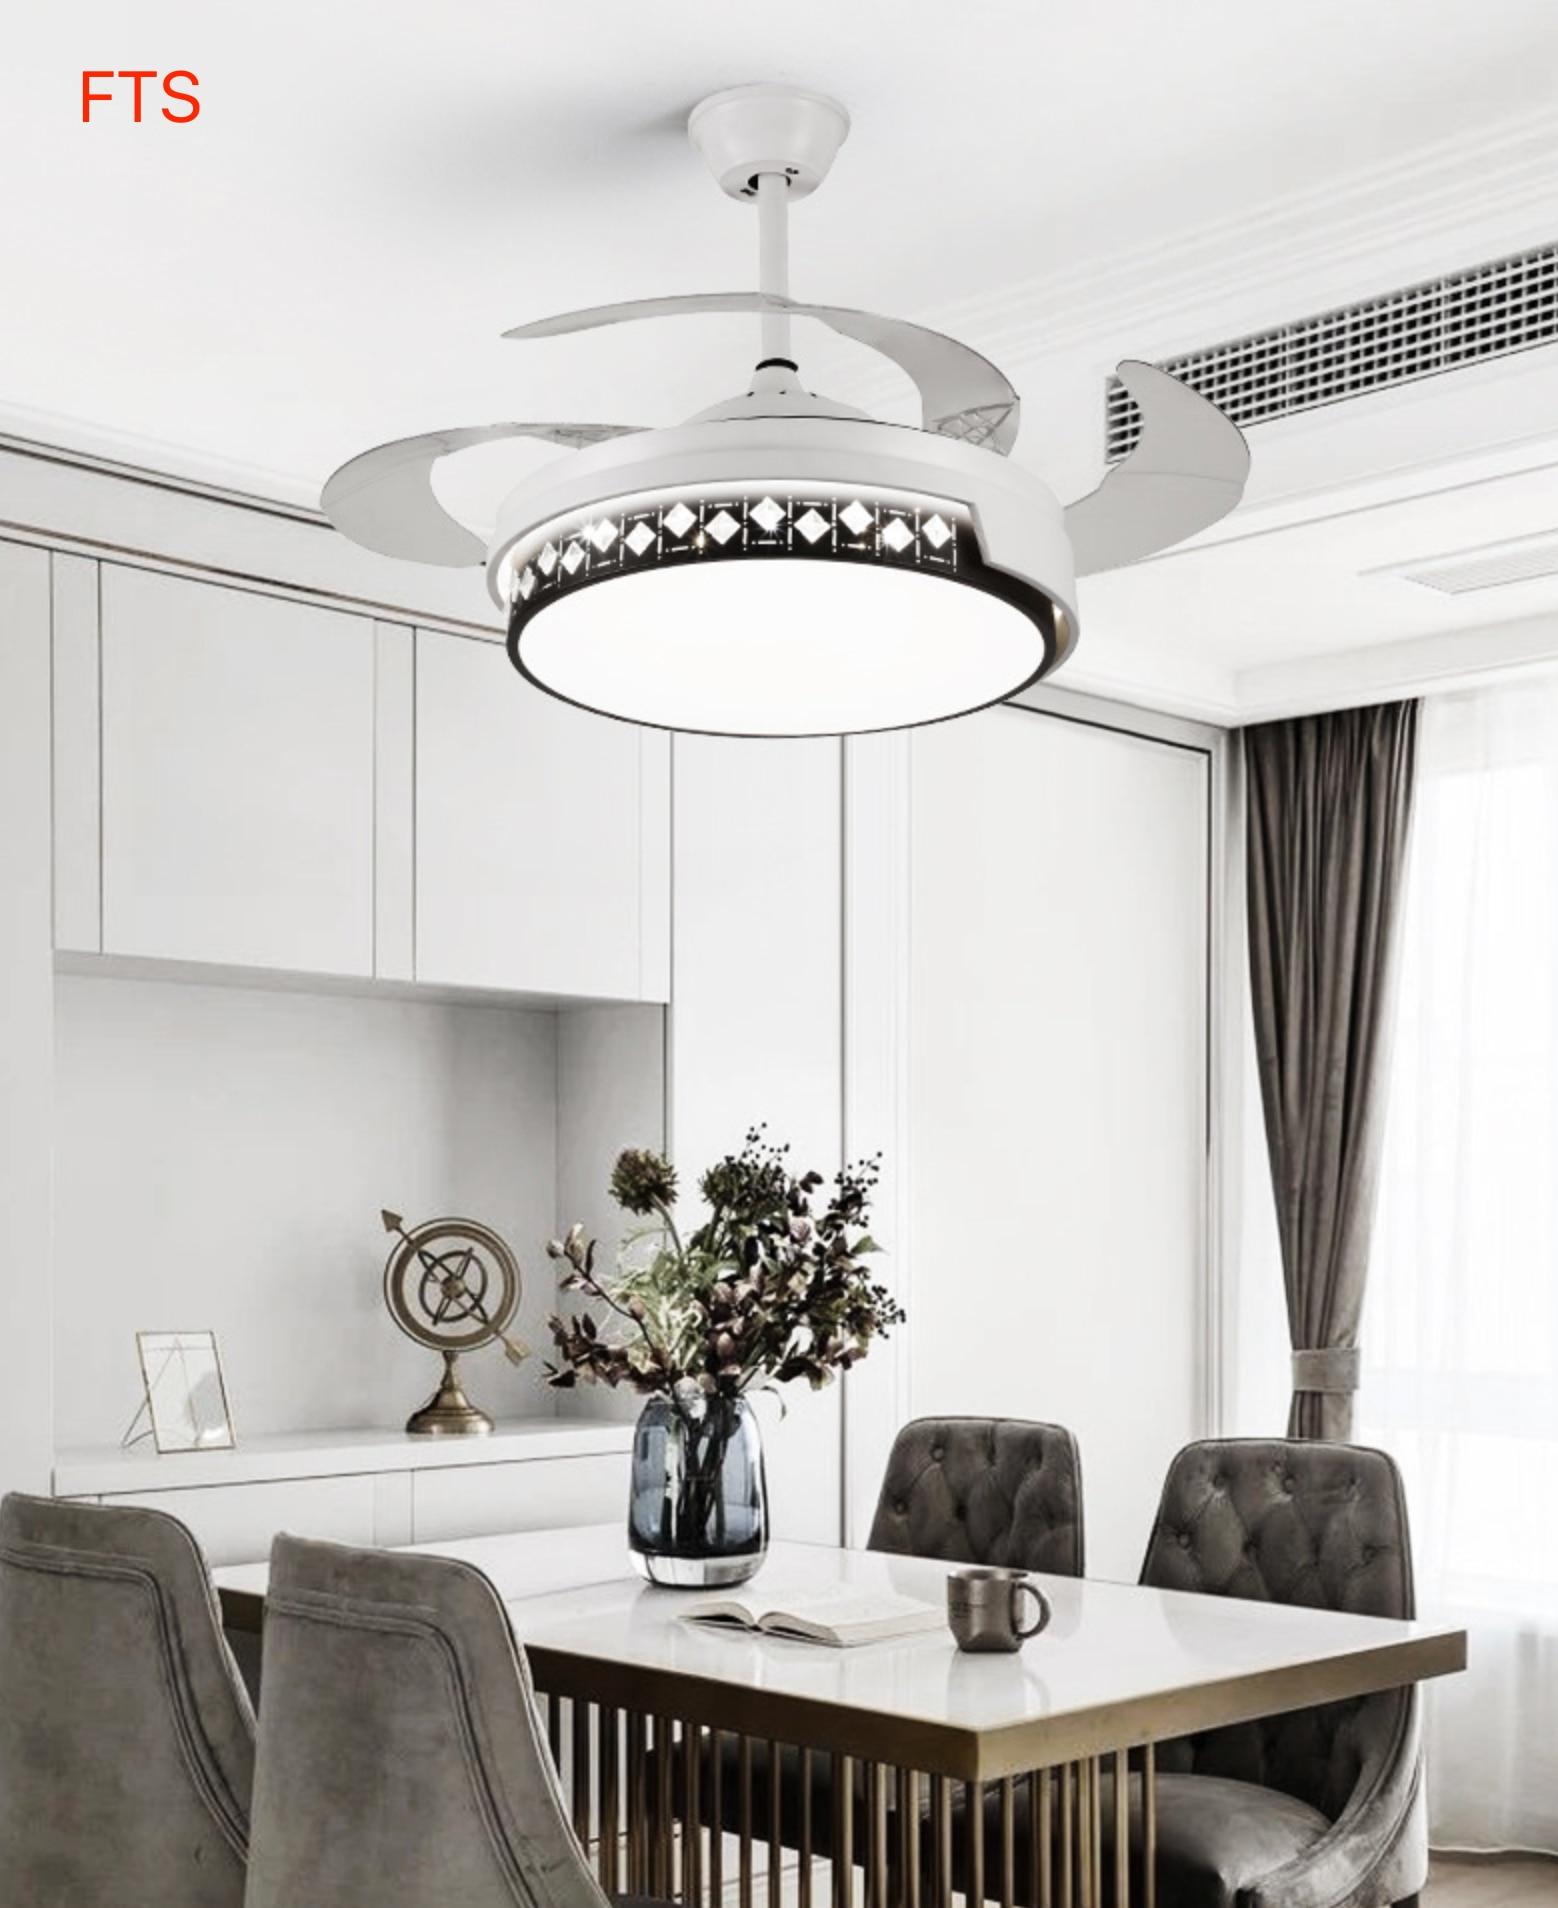 Fan Light Invisible Light Luxury Simple Living Room Light Bedroom New Fan Light Remote Control Nordic Ceiling Fan Light By Scientific Process